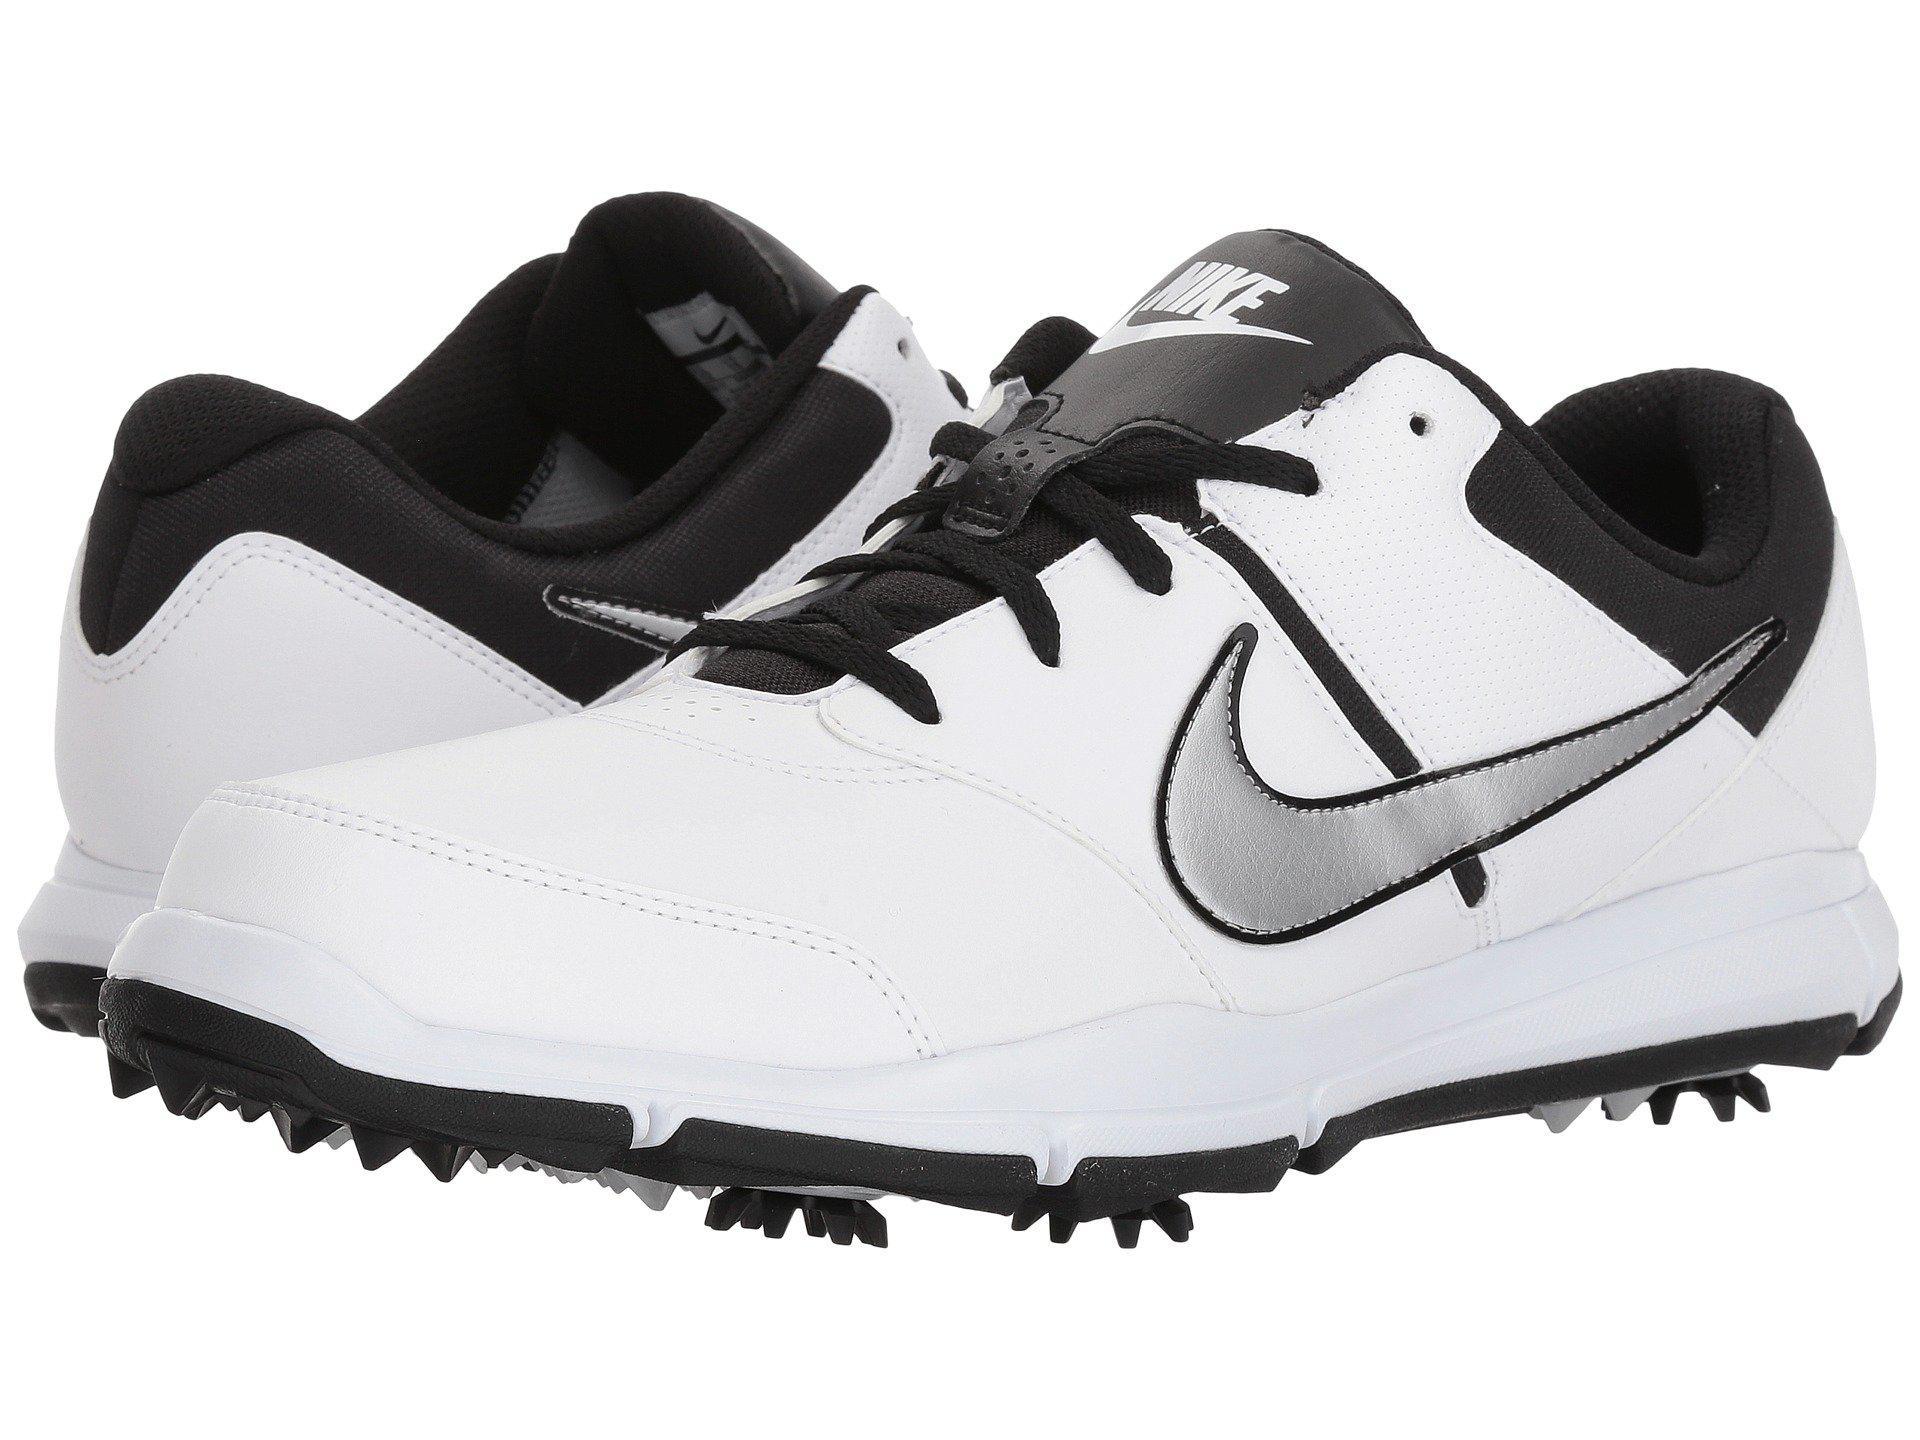 Lyst - Nike Durasport 4 (black metallic Silver black) Men s Golf ... 13aaaaf91